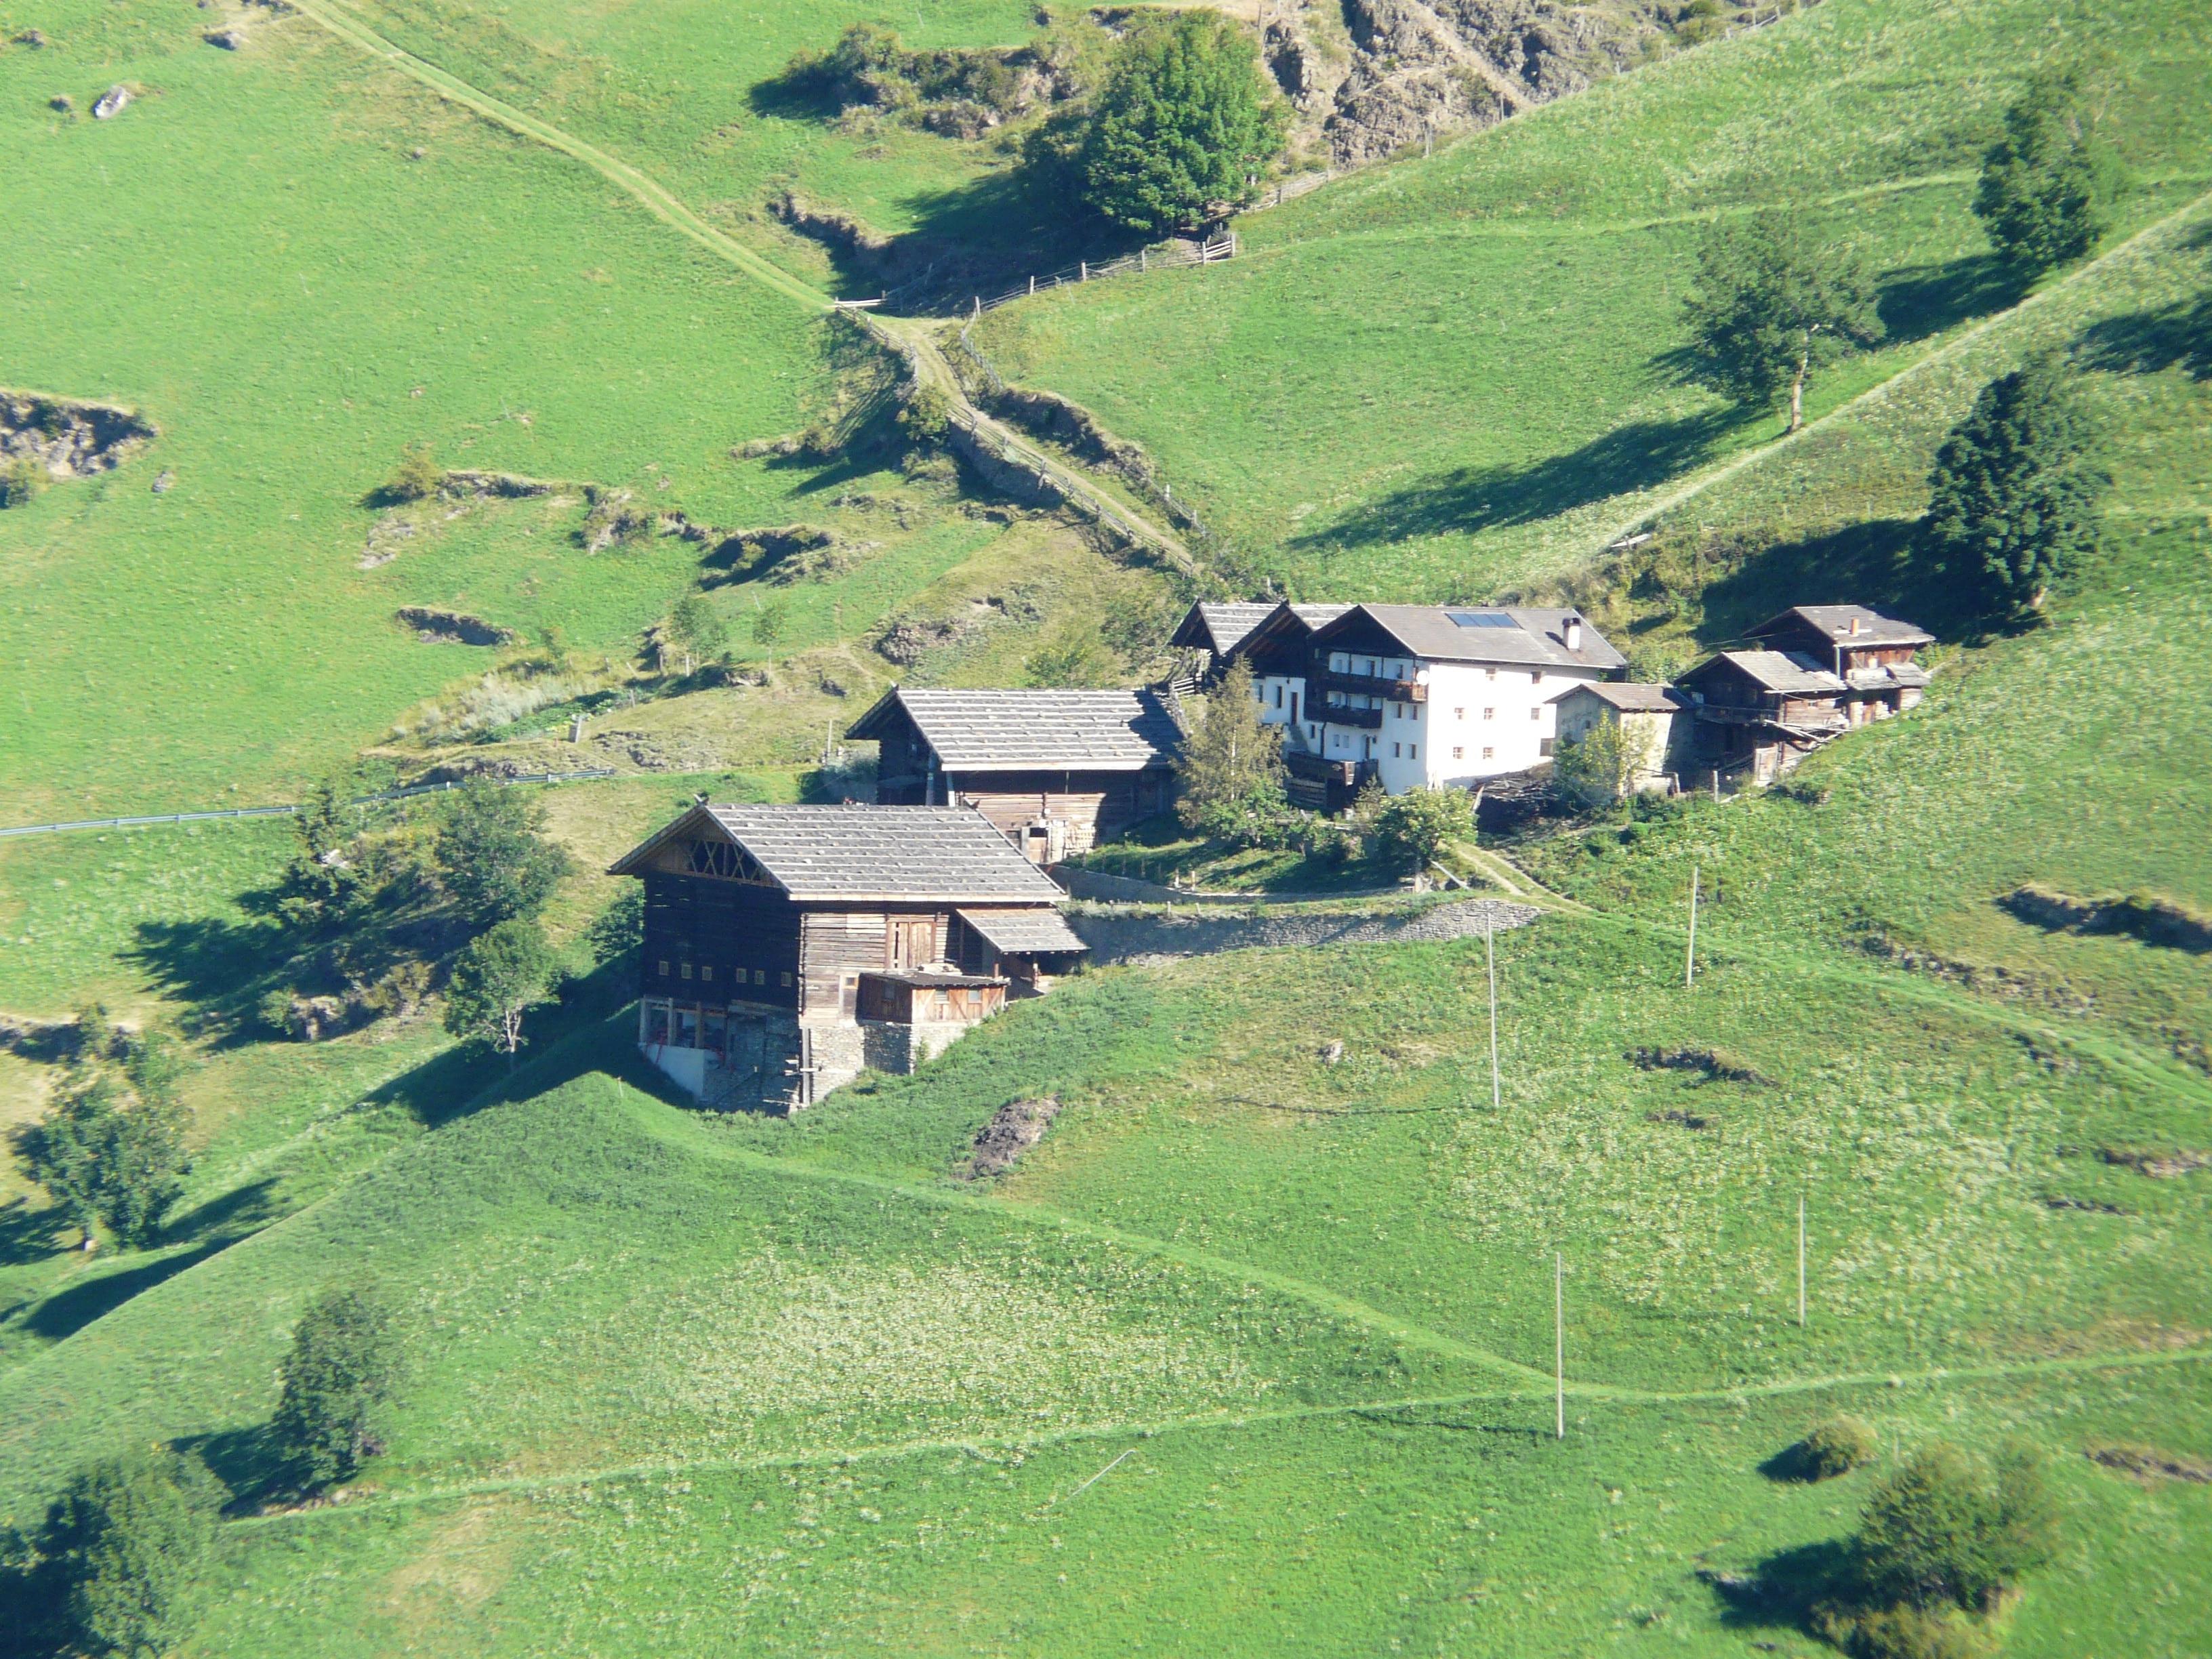 Val Senales, Senales, Trentino-Zuid-Tirol, Italië